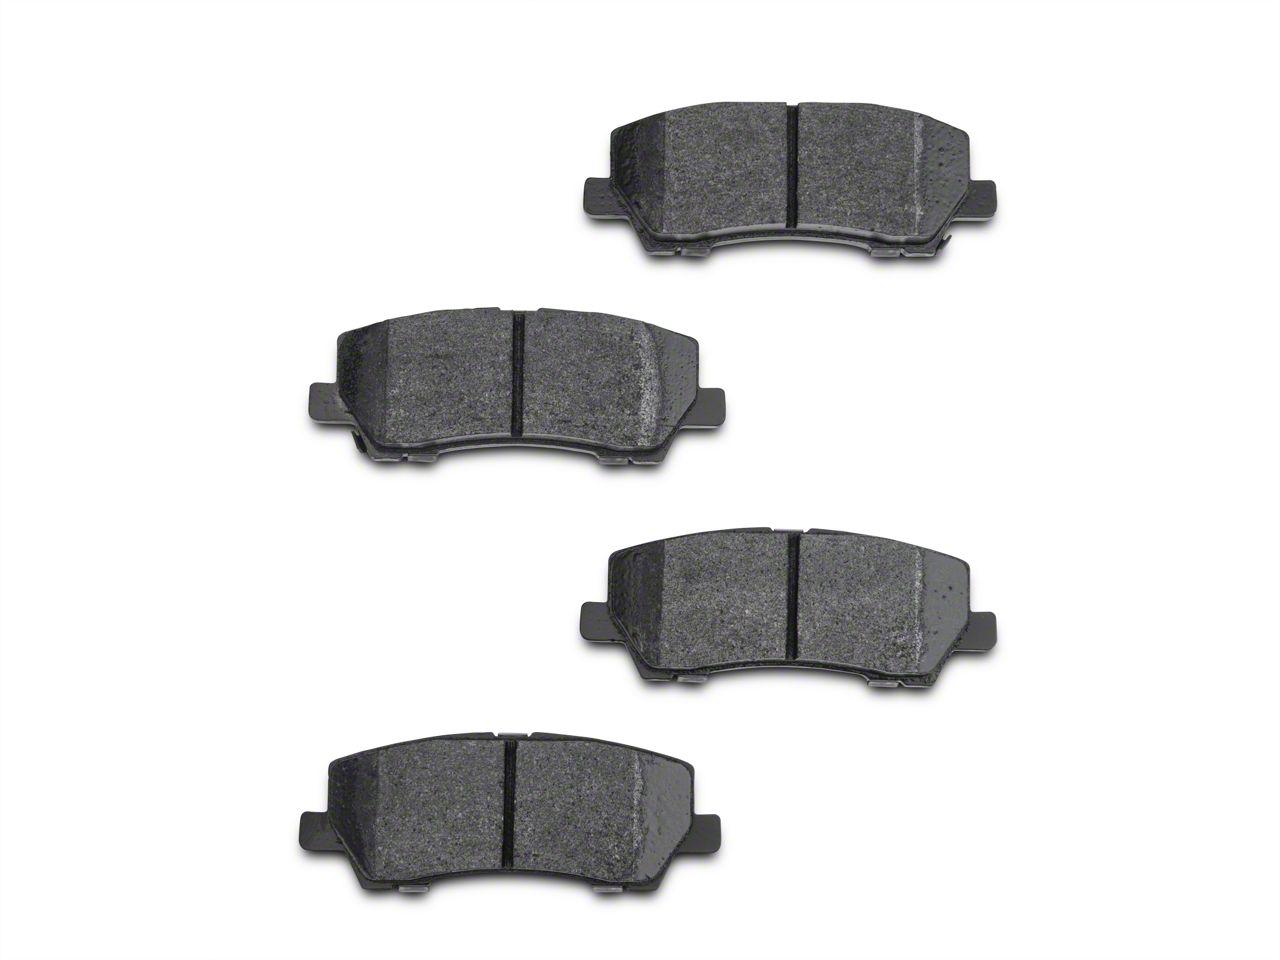 Hawk Performance HPS 5.0 Brake Pads - Rear Pair (15-19 GT w/ Performance Pack)